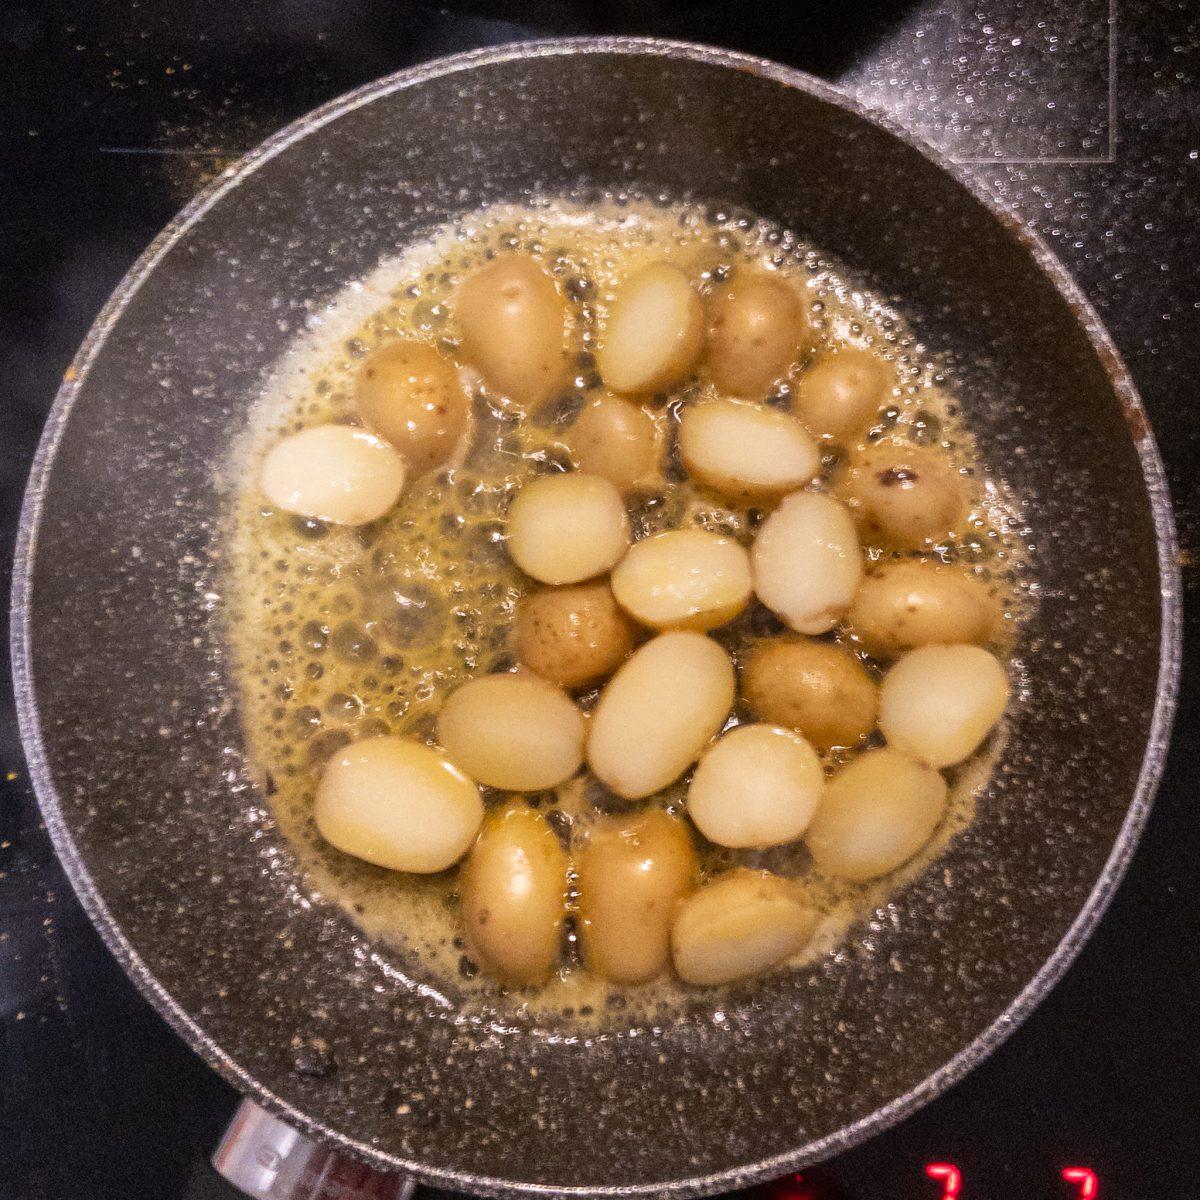 Instructions_Recette_Curry_pois_chiches_chou-fleur_pdt11